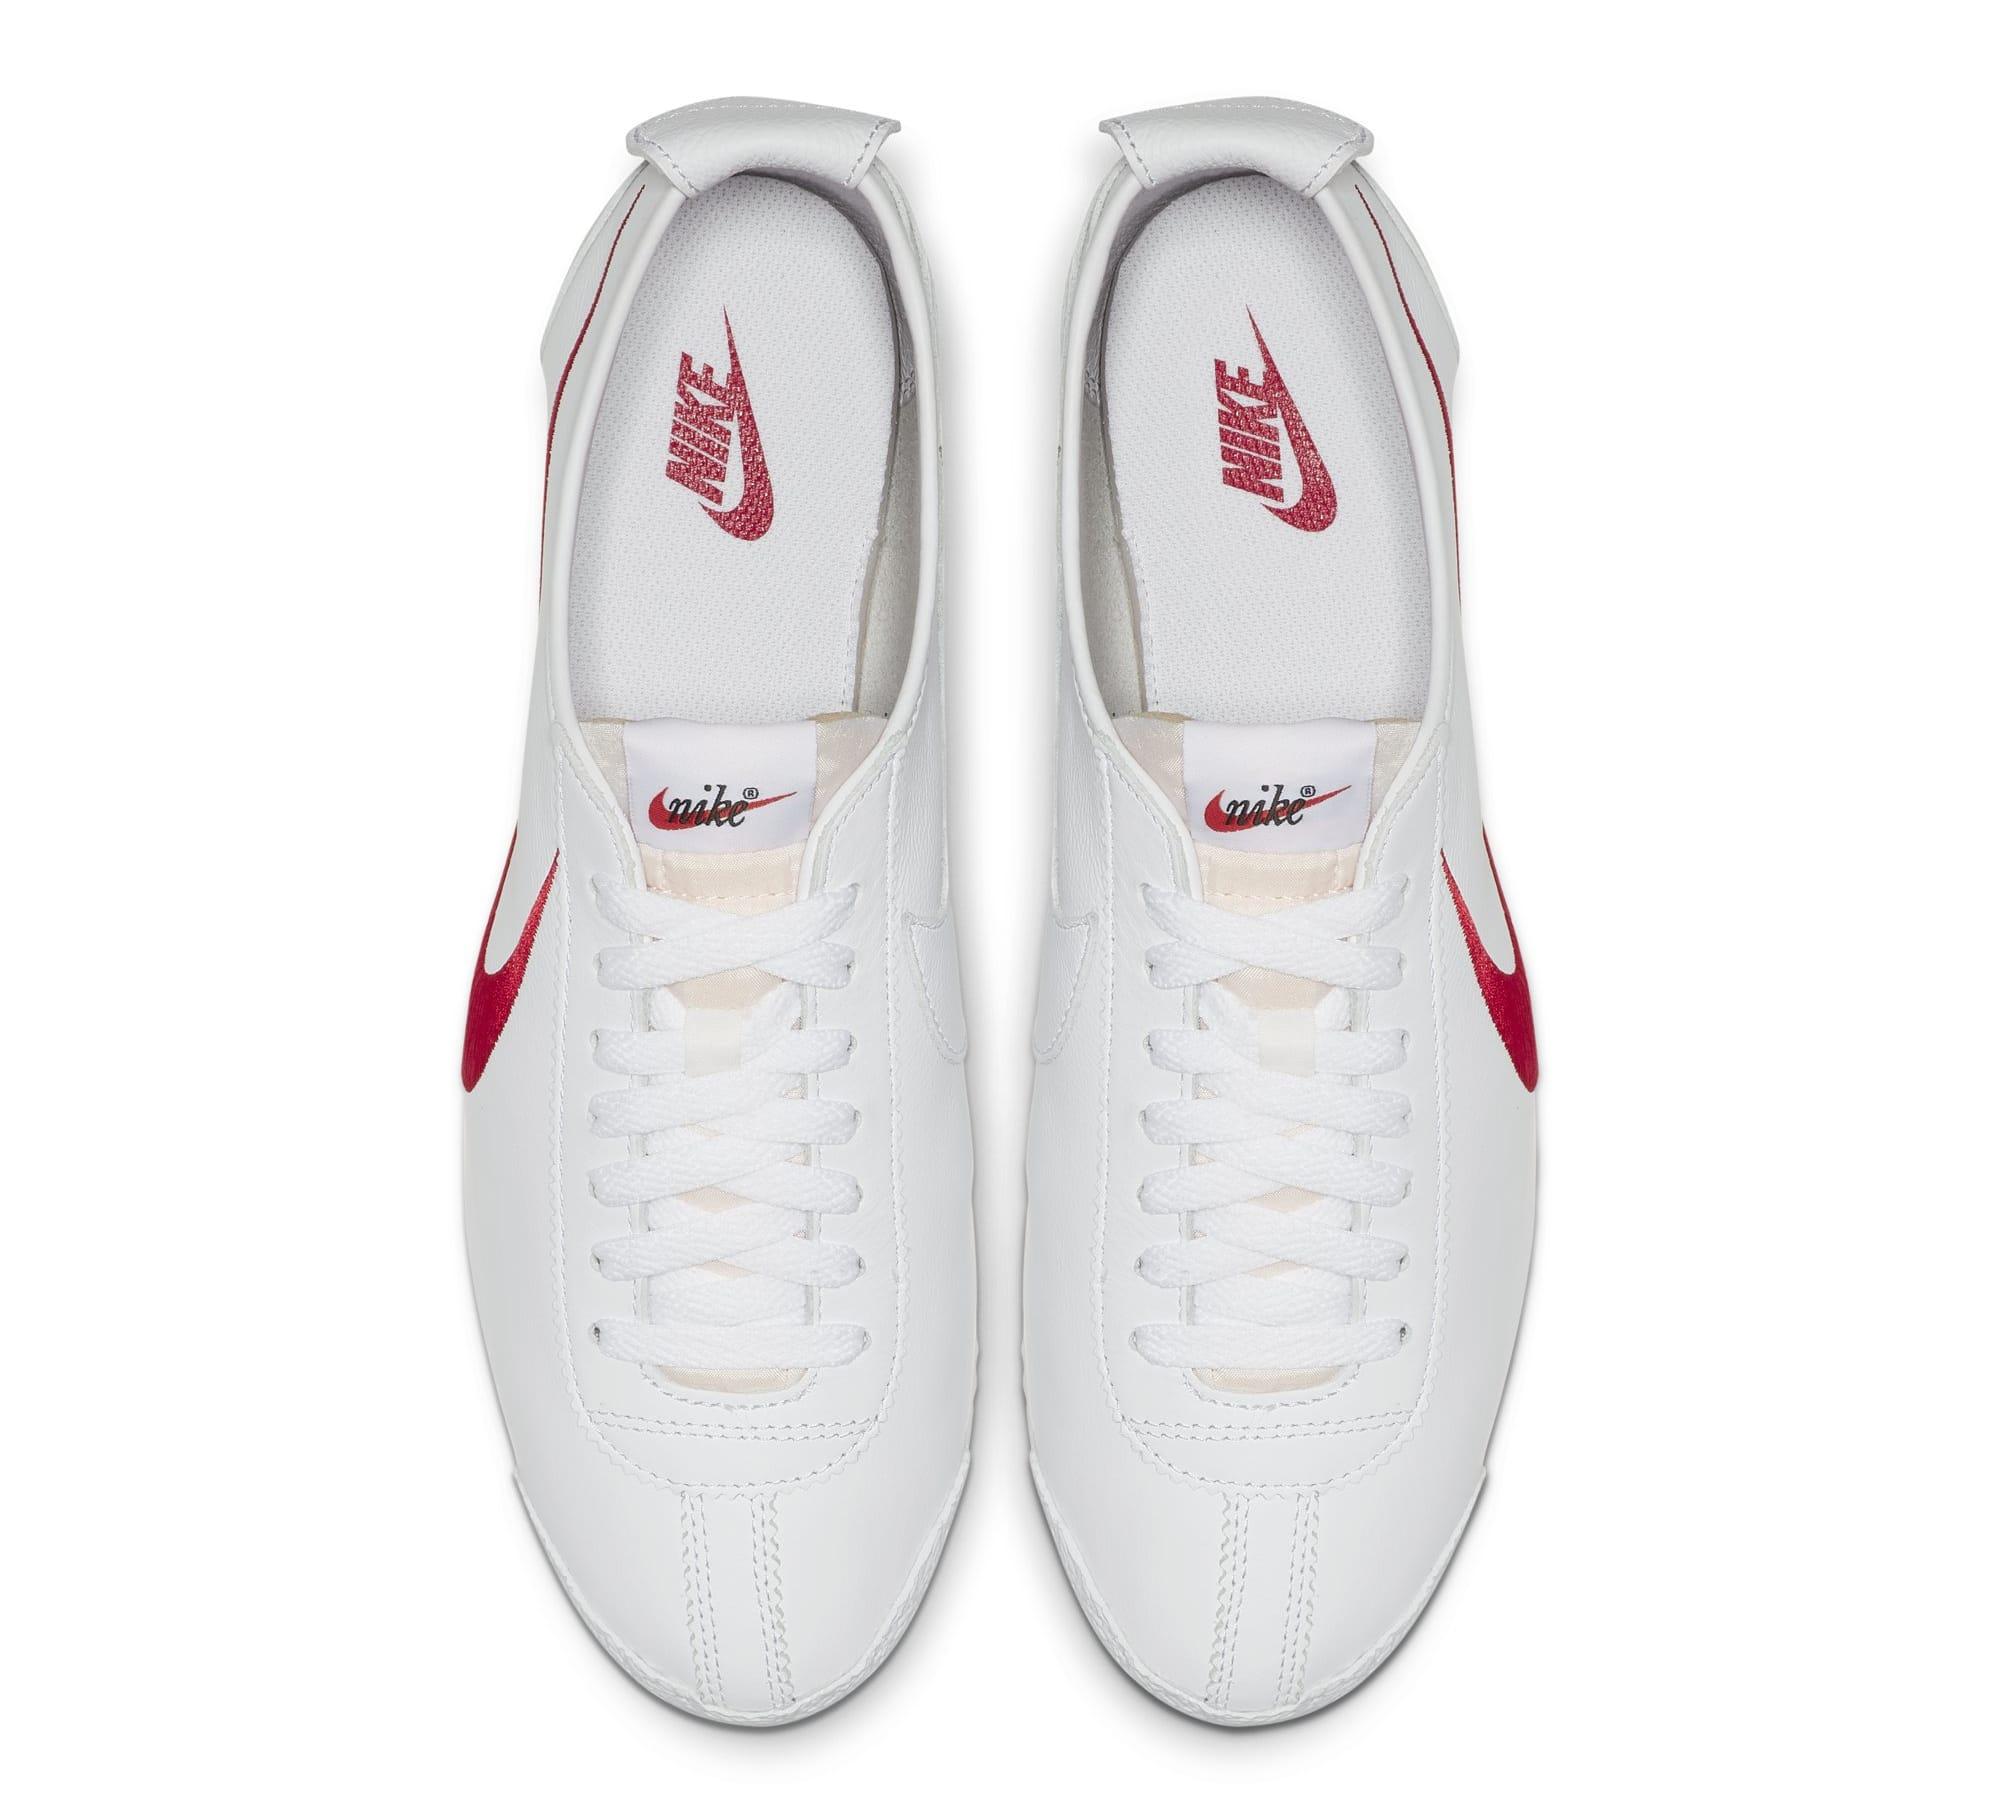 Nike Classic Cortez 'Shoe Dog Pack (Swoosh)' CJ2586-100 (Top)